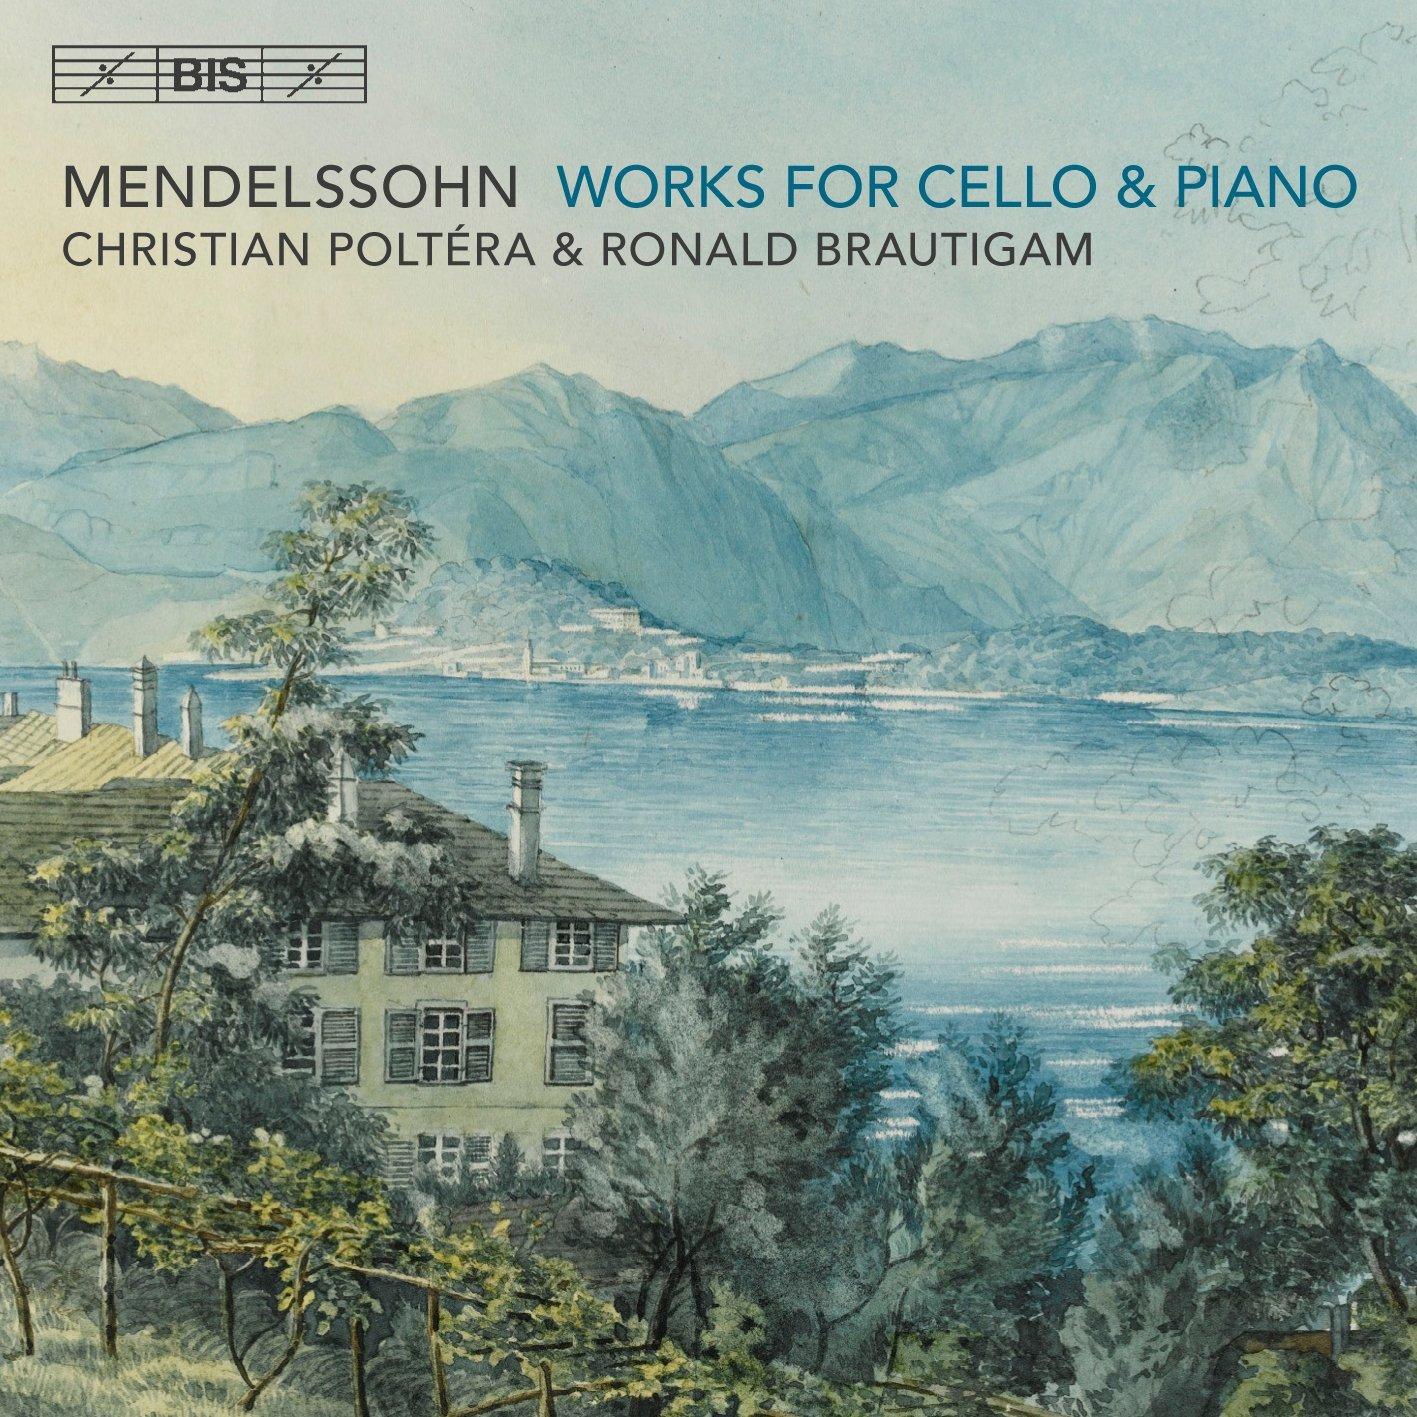 SACD : CHRISTIAN POLTERA / RONALD BRAUTIGA - Works For Cello & Piano (Hybrid SACD)